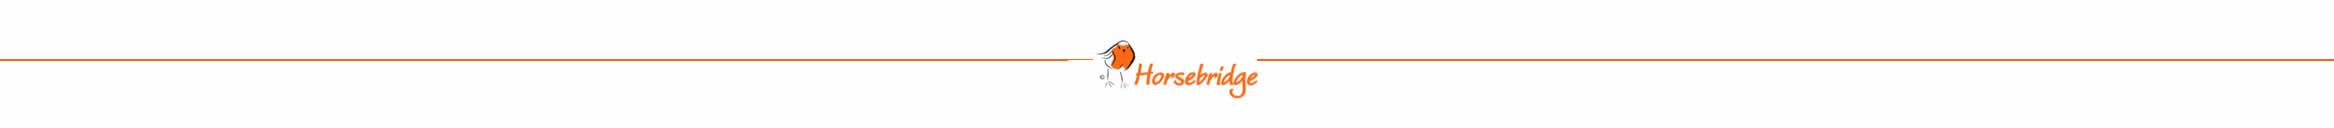 Horsebridge vets Hailsham logo